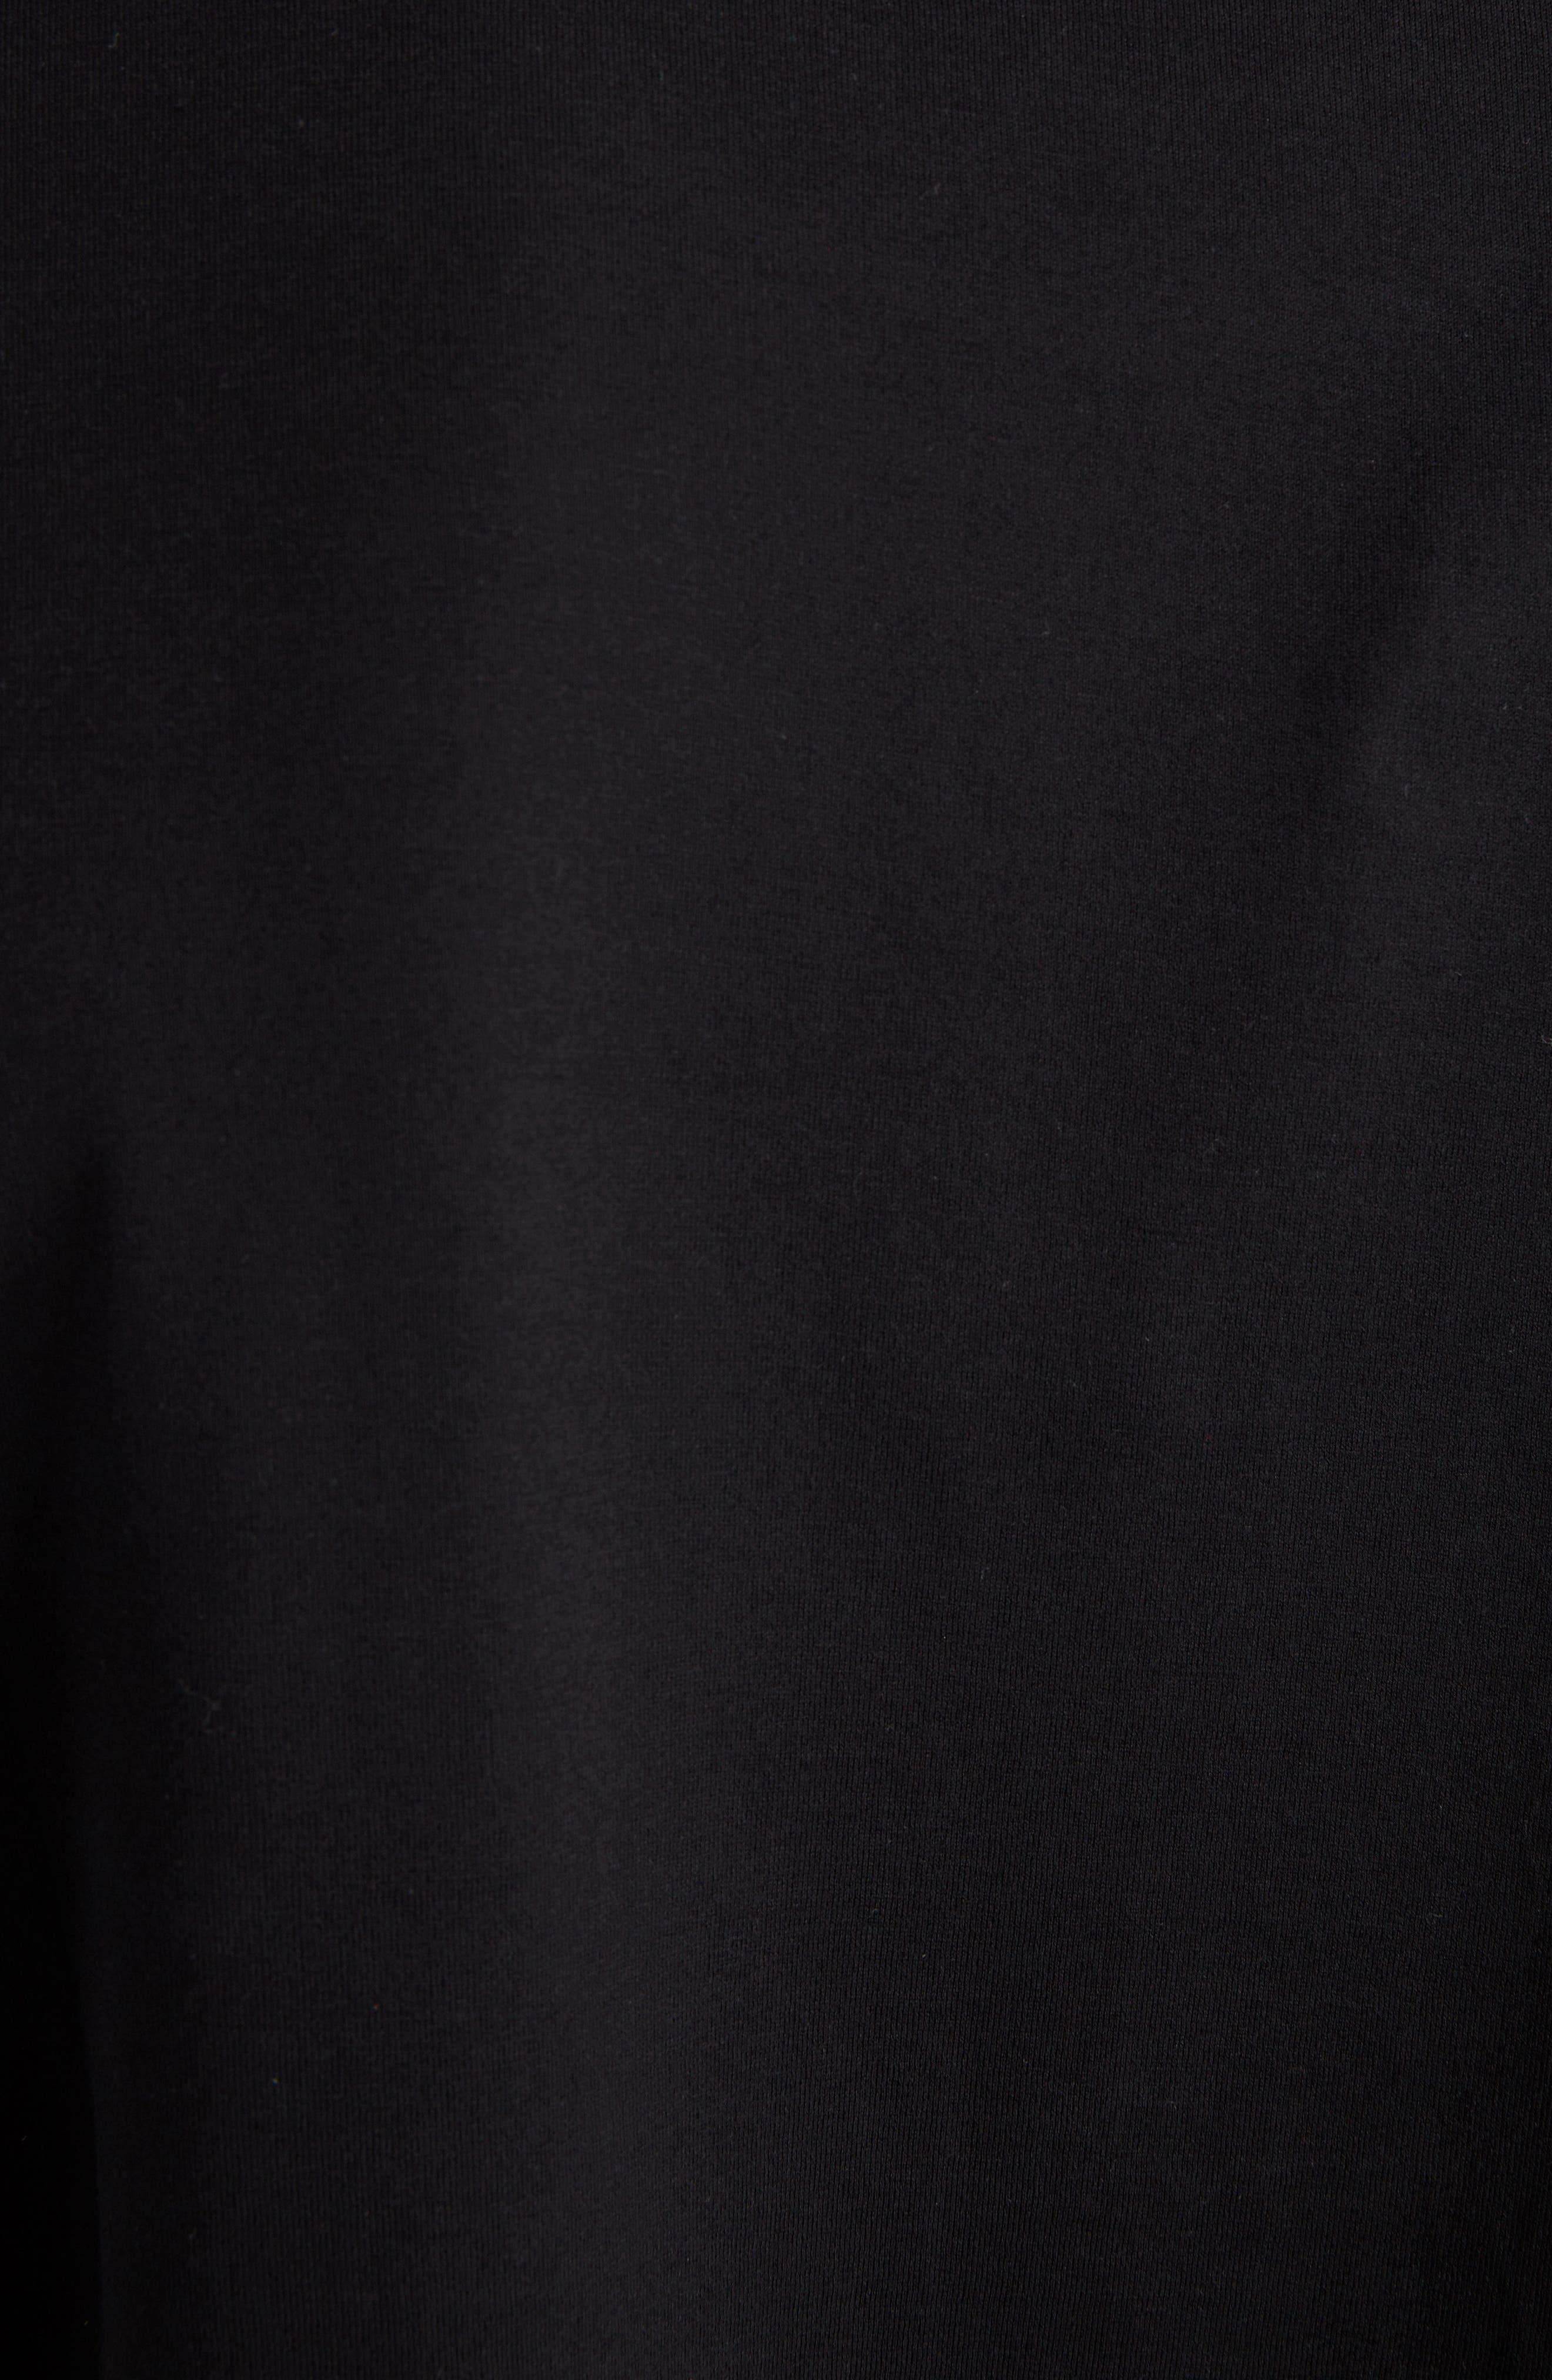 Abstract 4G Logo T-Shirt,                             Alternate thumbnail 5, color,                             BLACK